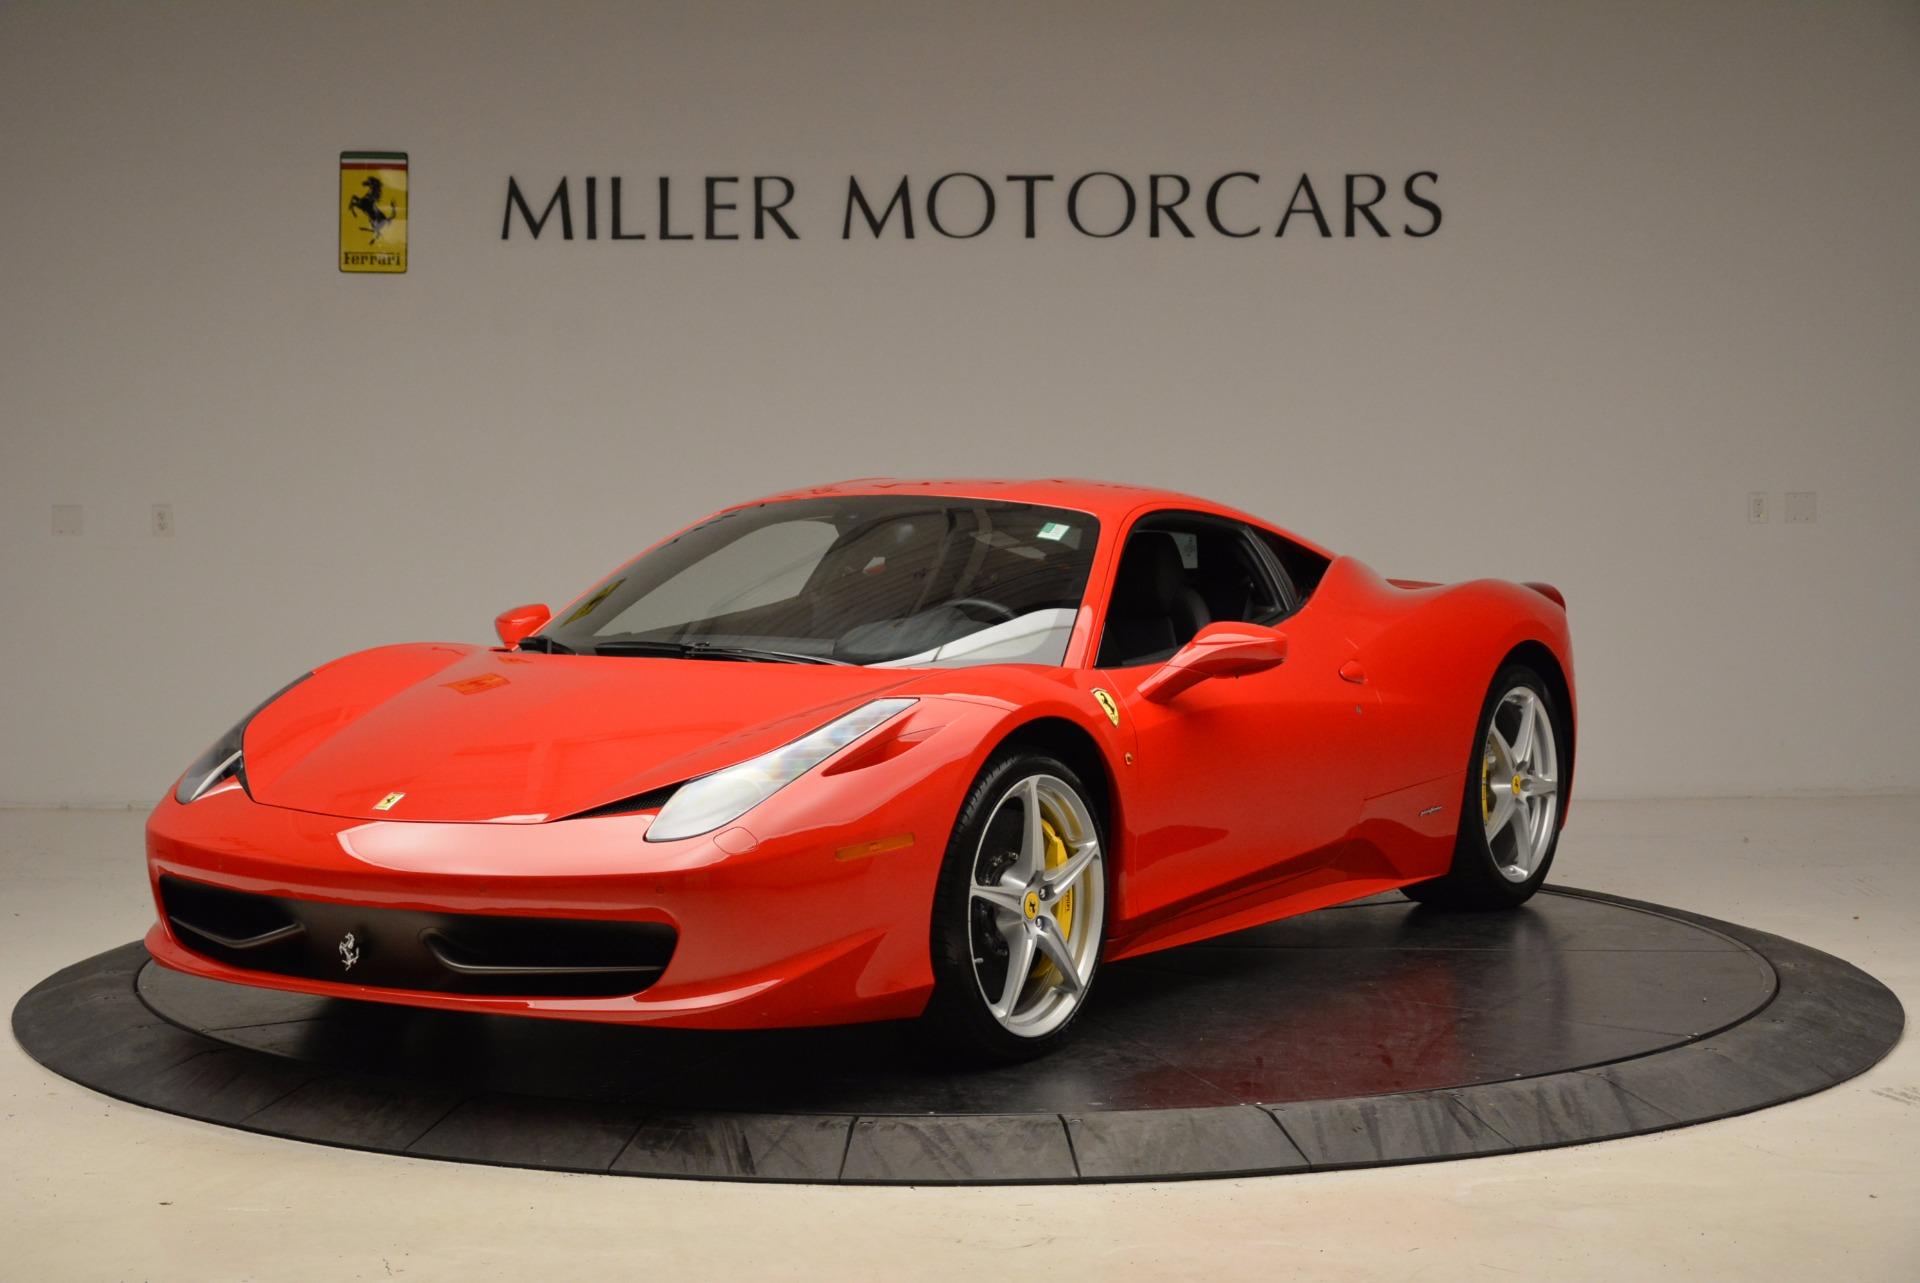 Used 2012 Ferrari 458 Italia for sale Sold at Rolls-Royce Motor Cars Greenwich in Greenwich CT 06830 1